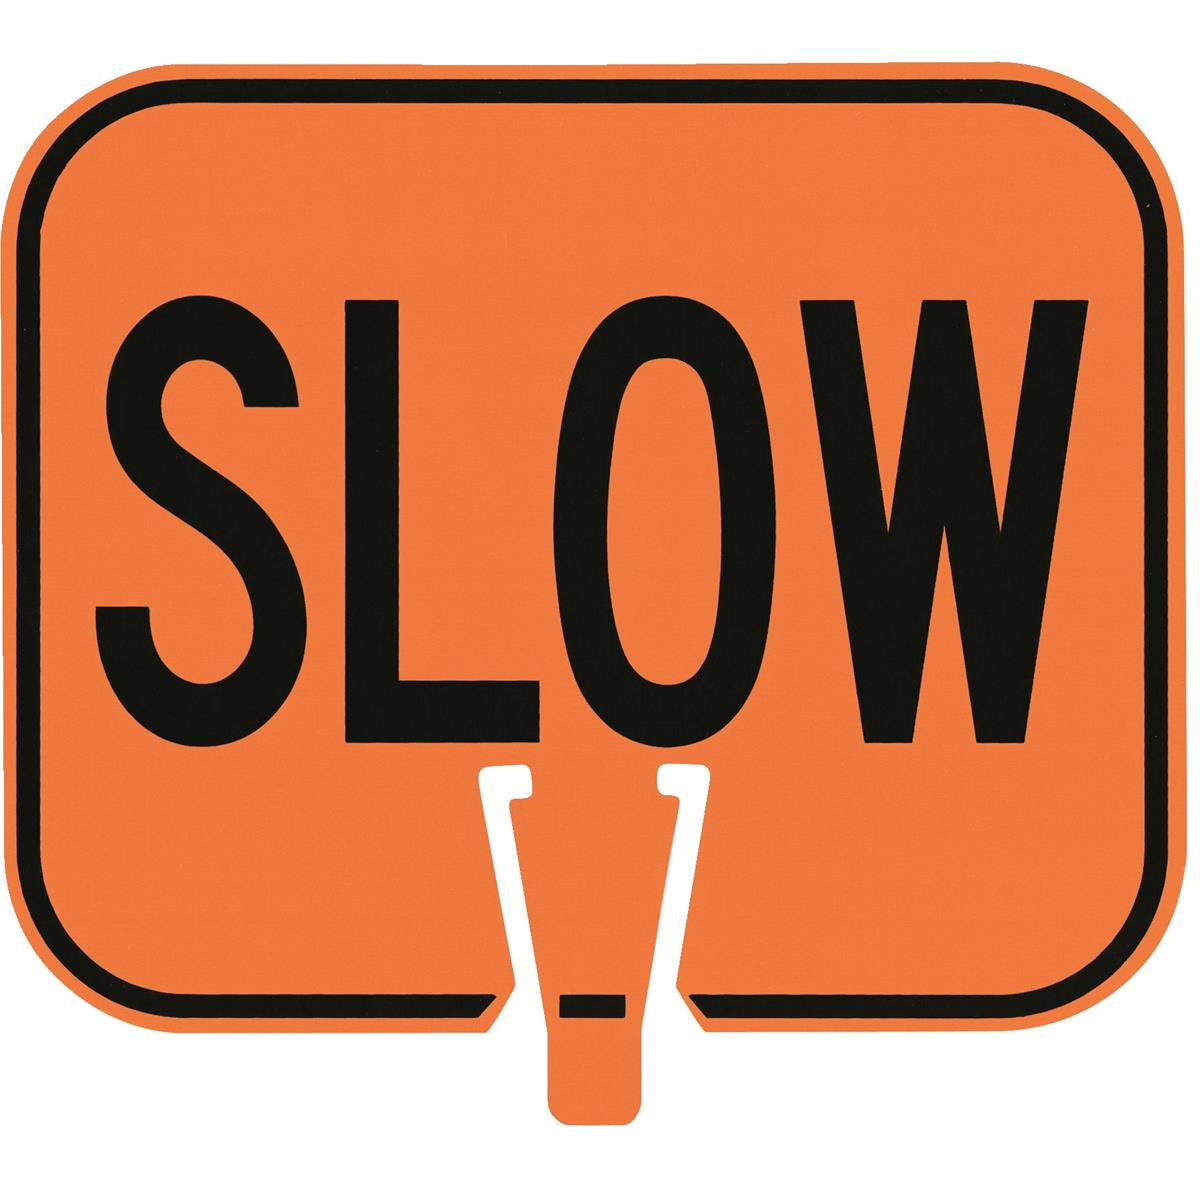 "Slow"" Weather."